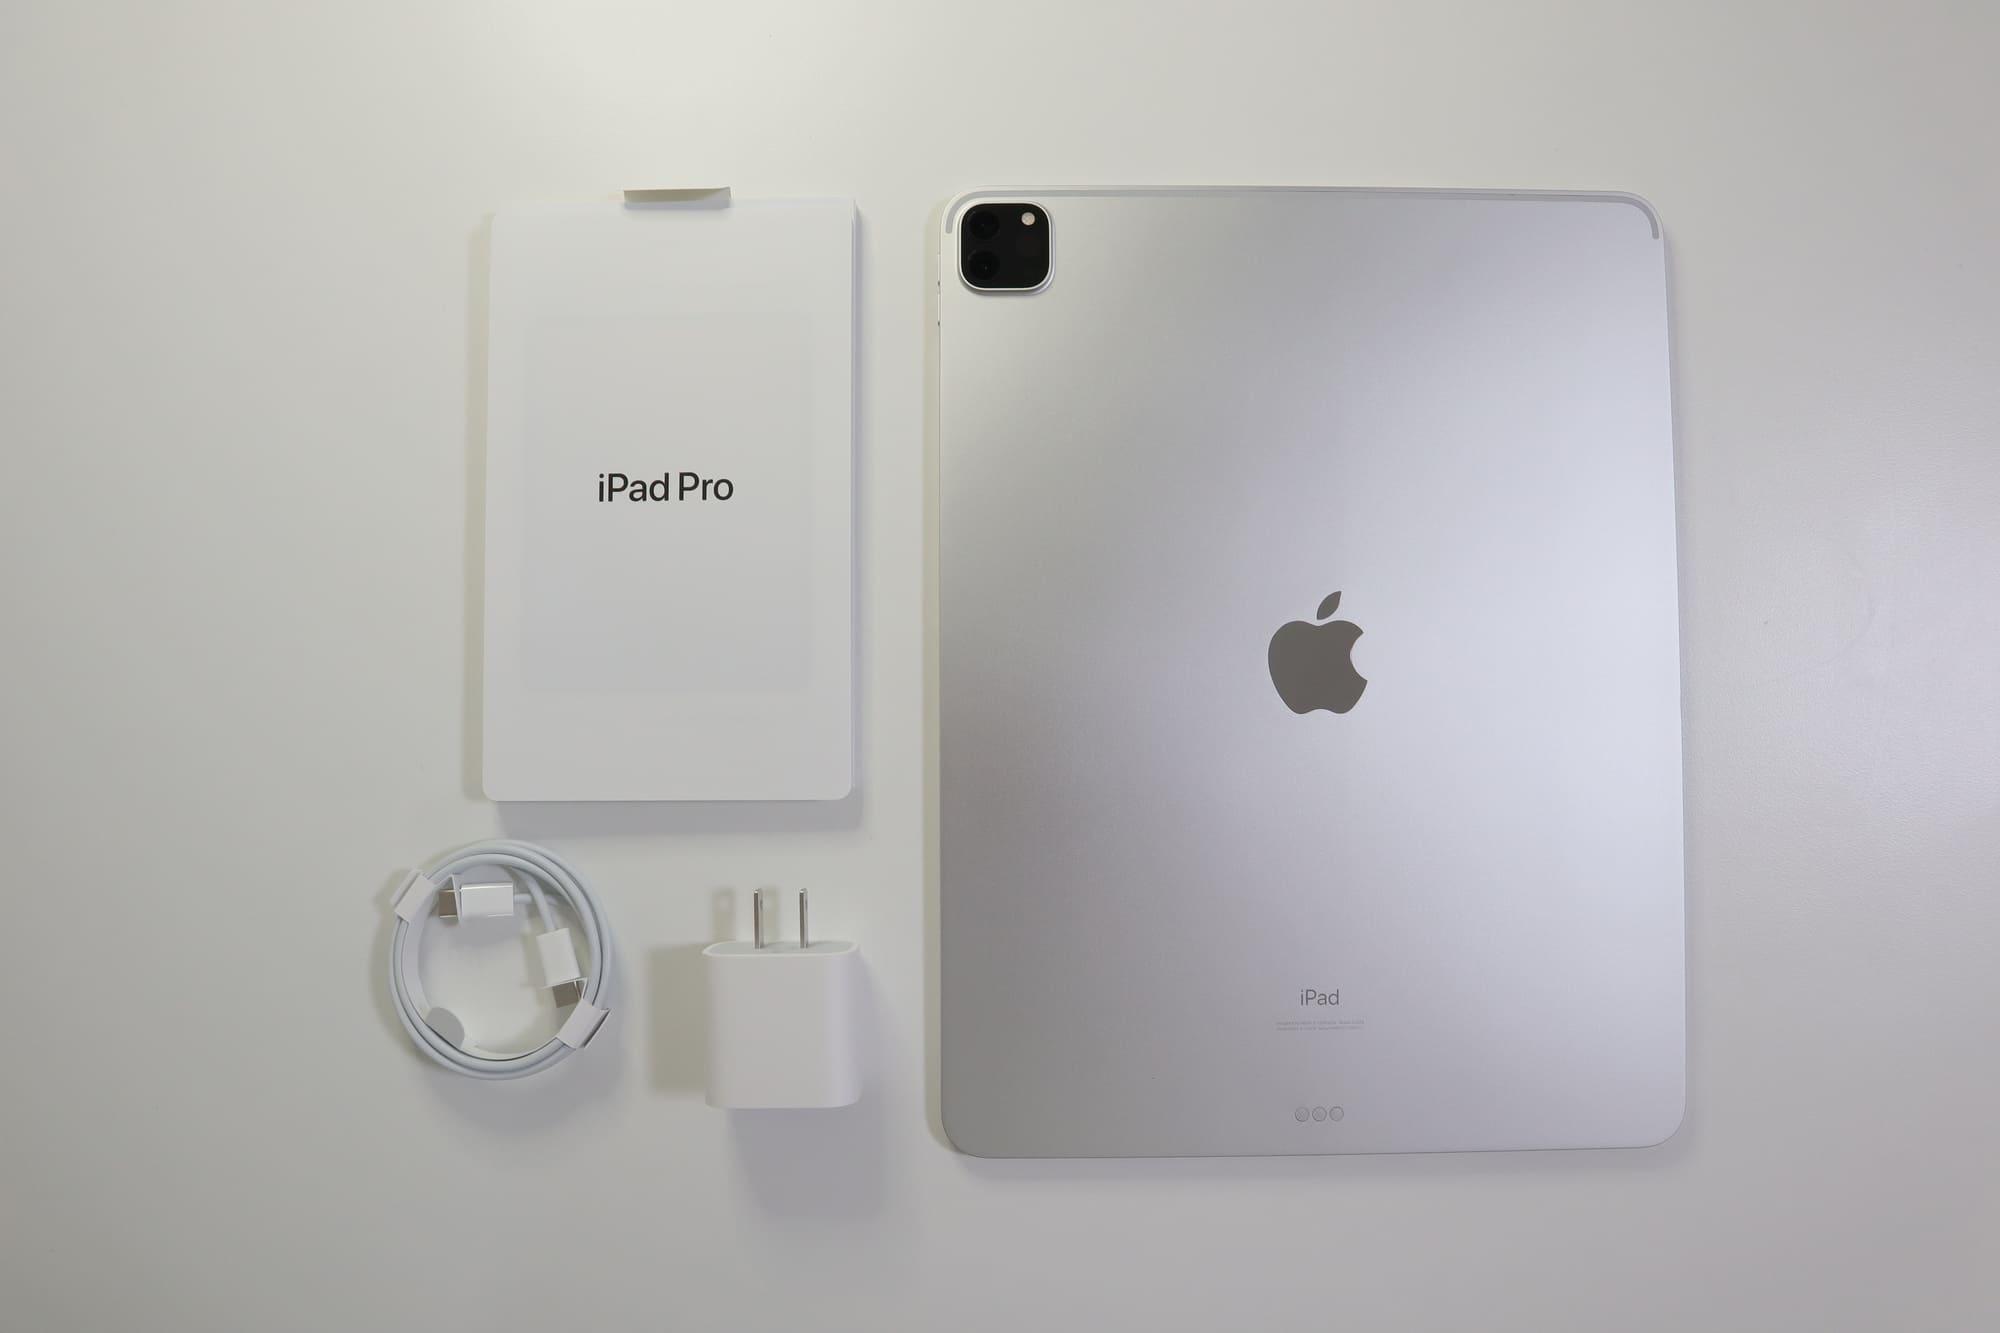 iPad Proの同梱品